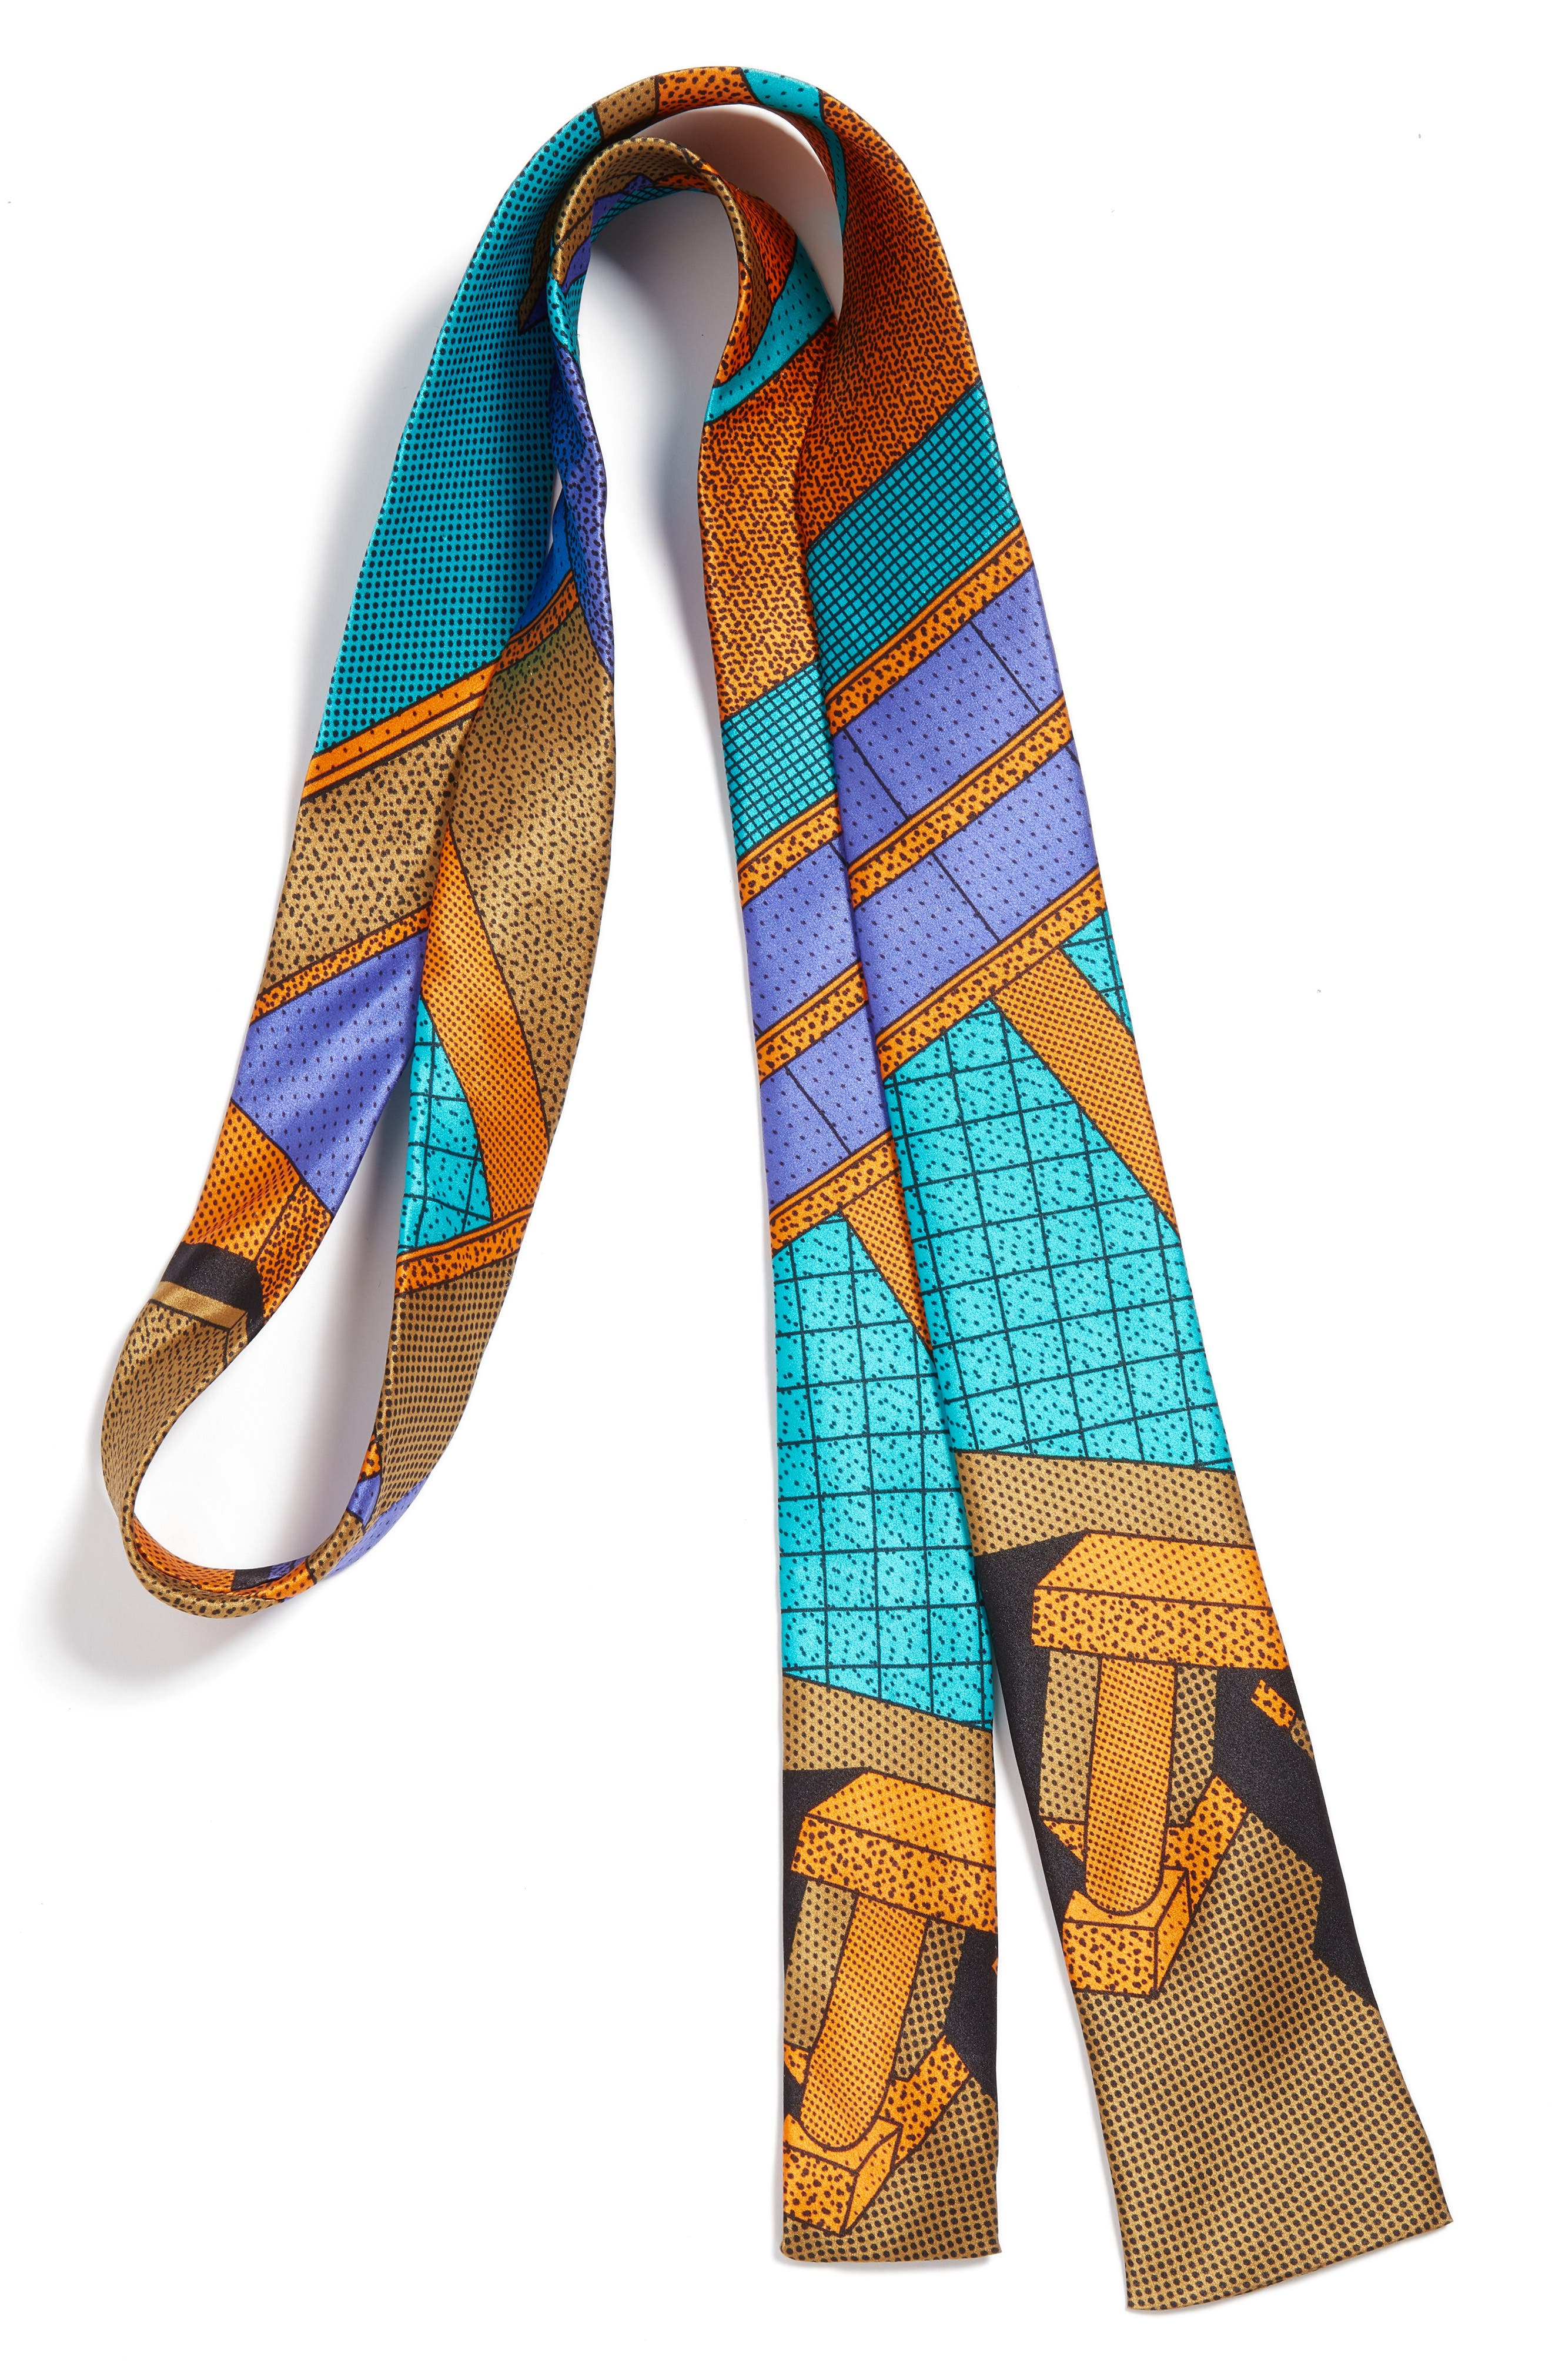 MEMPHIS Milano Teal/Orange Print Silk Tie,                         Main,                         color, 440